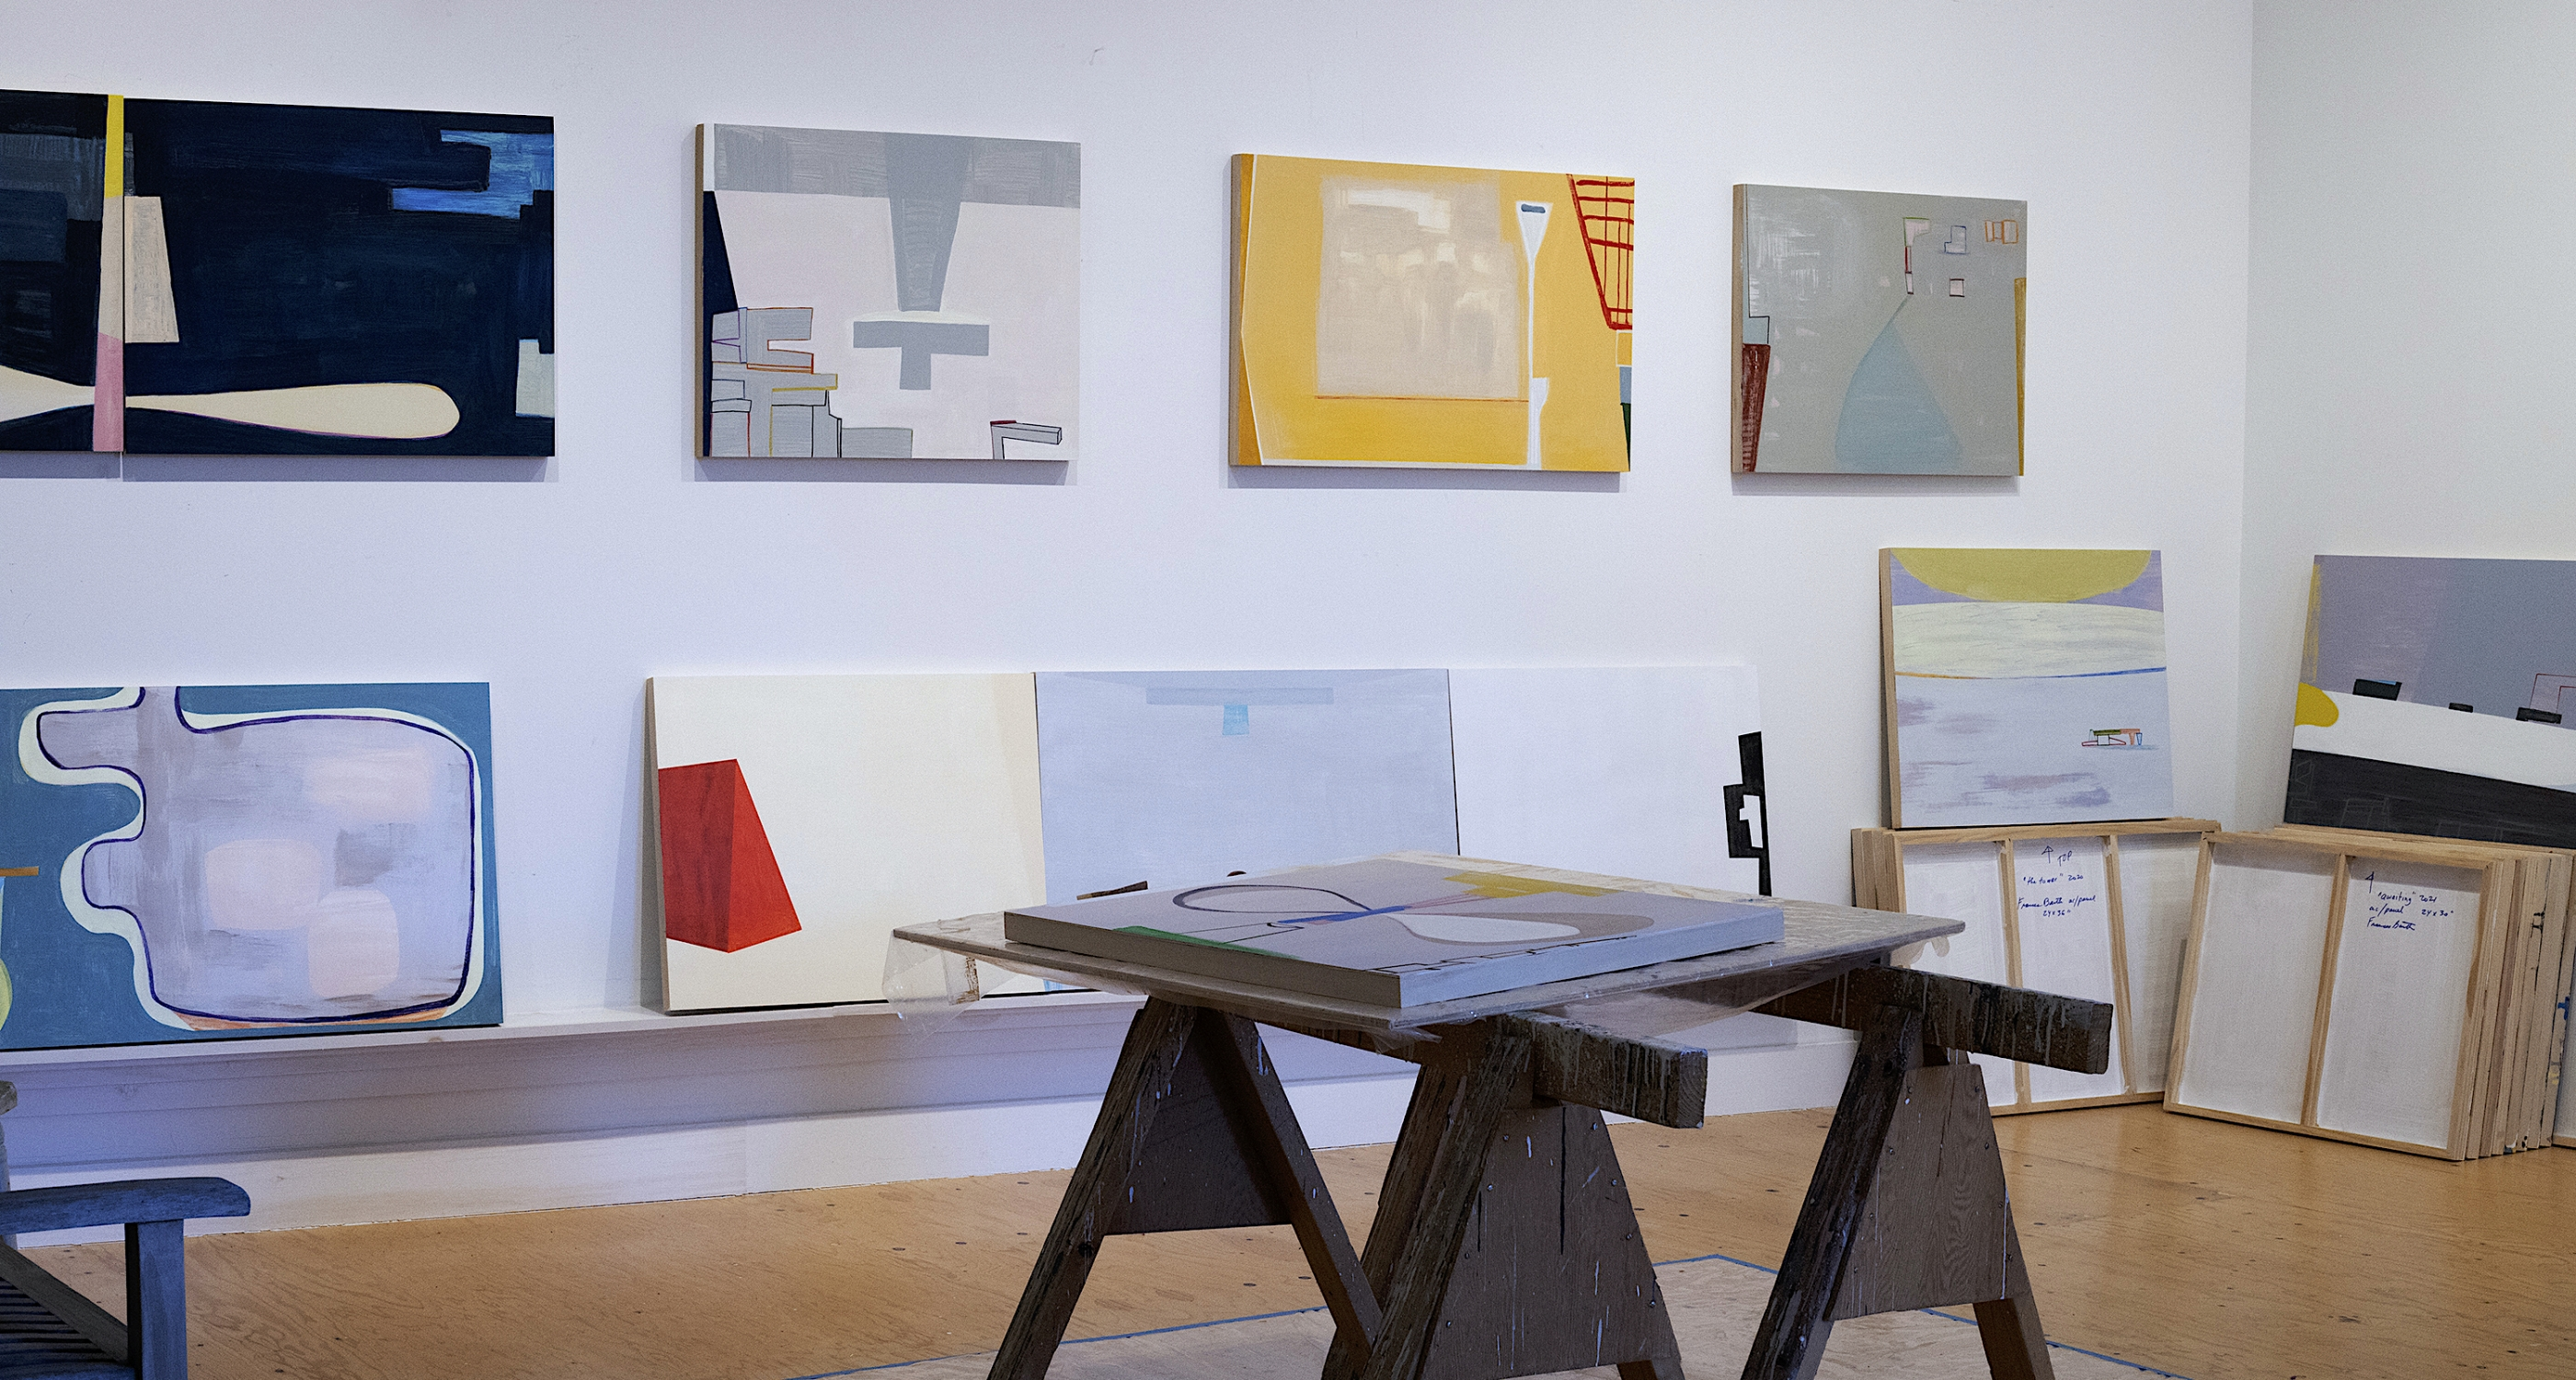 Frances Barth: In the studio of Frances Barth